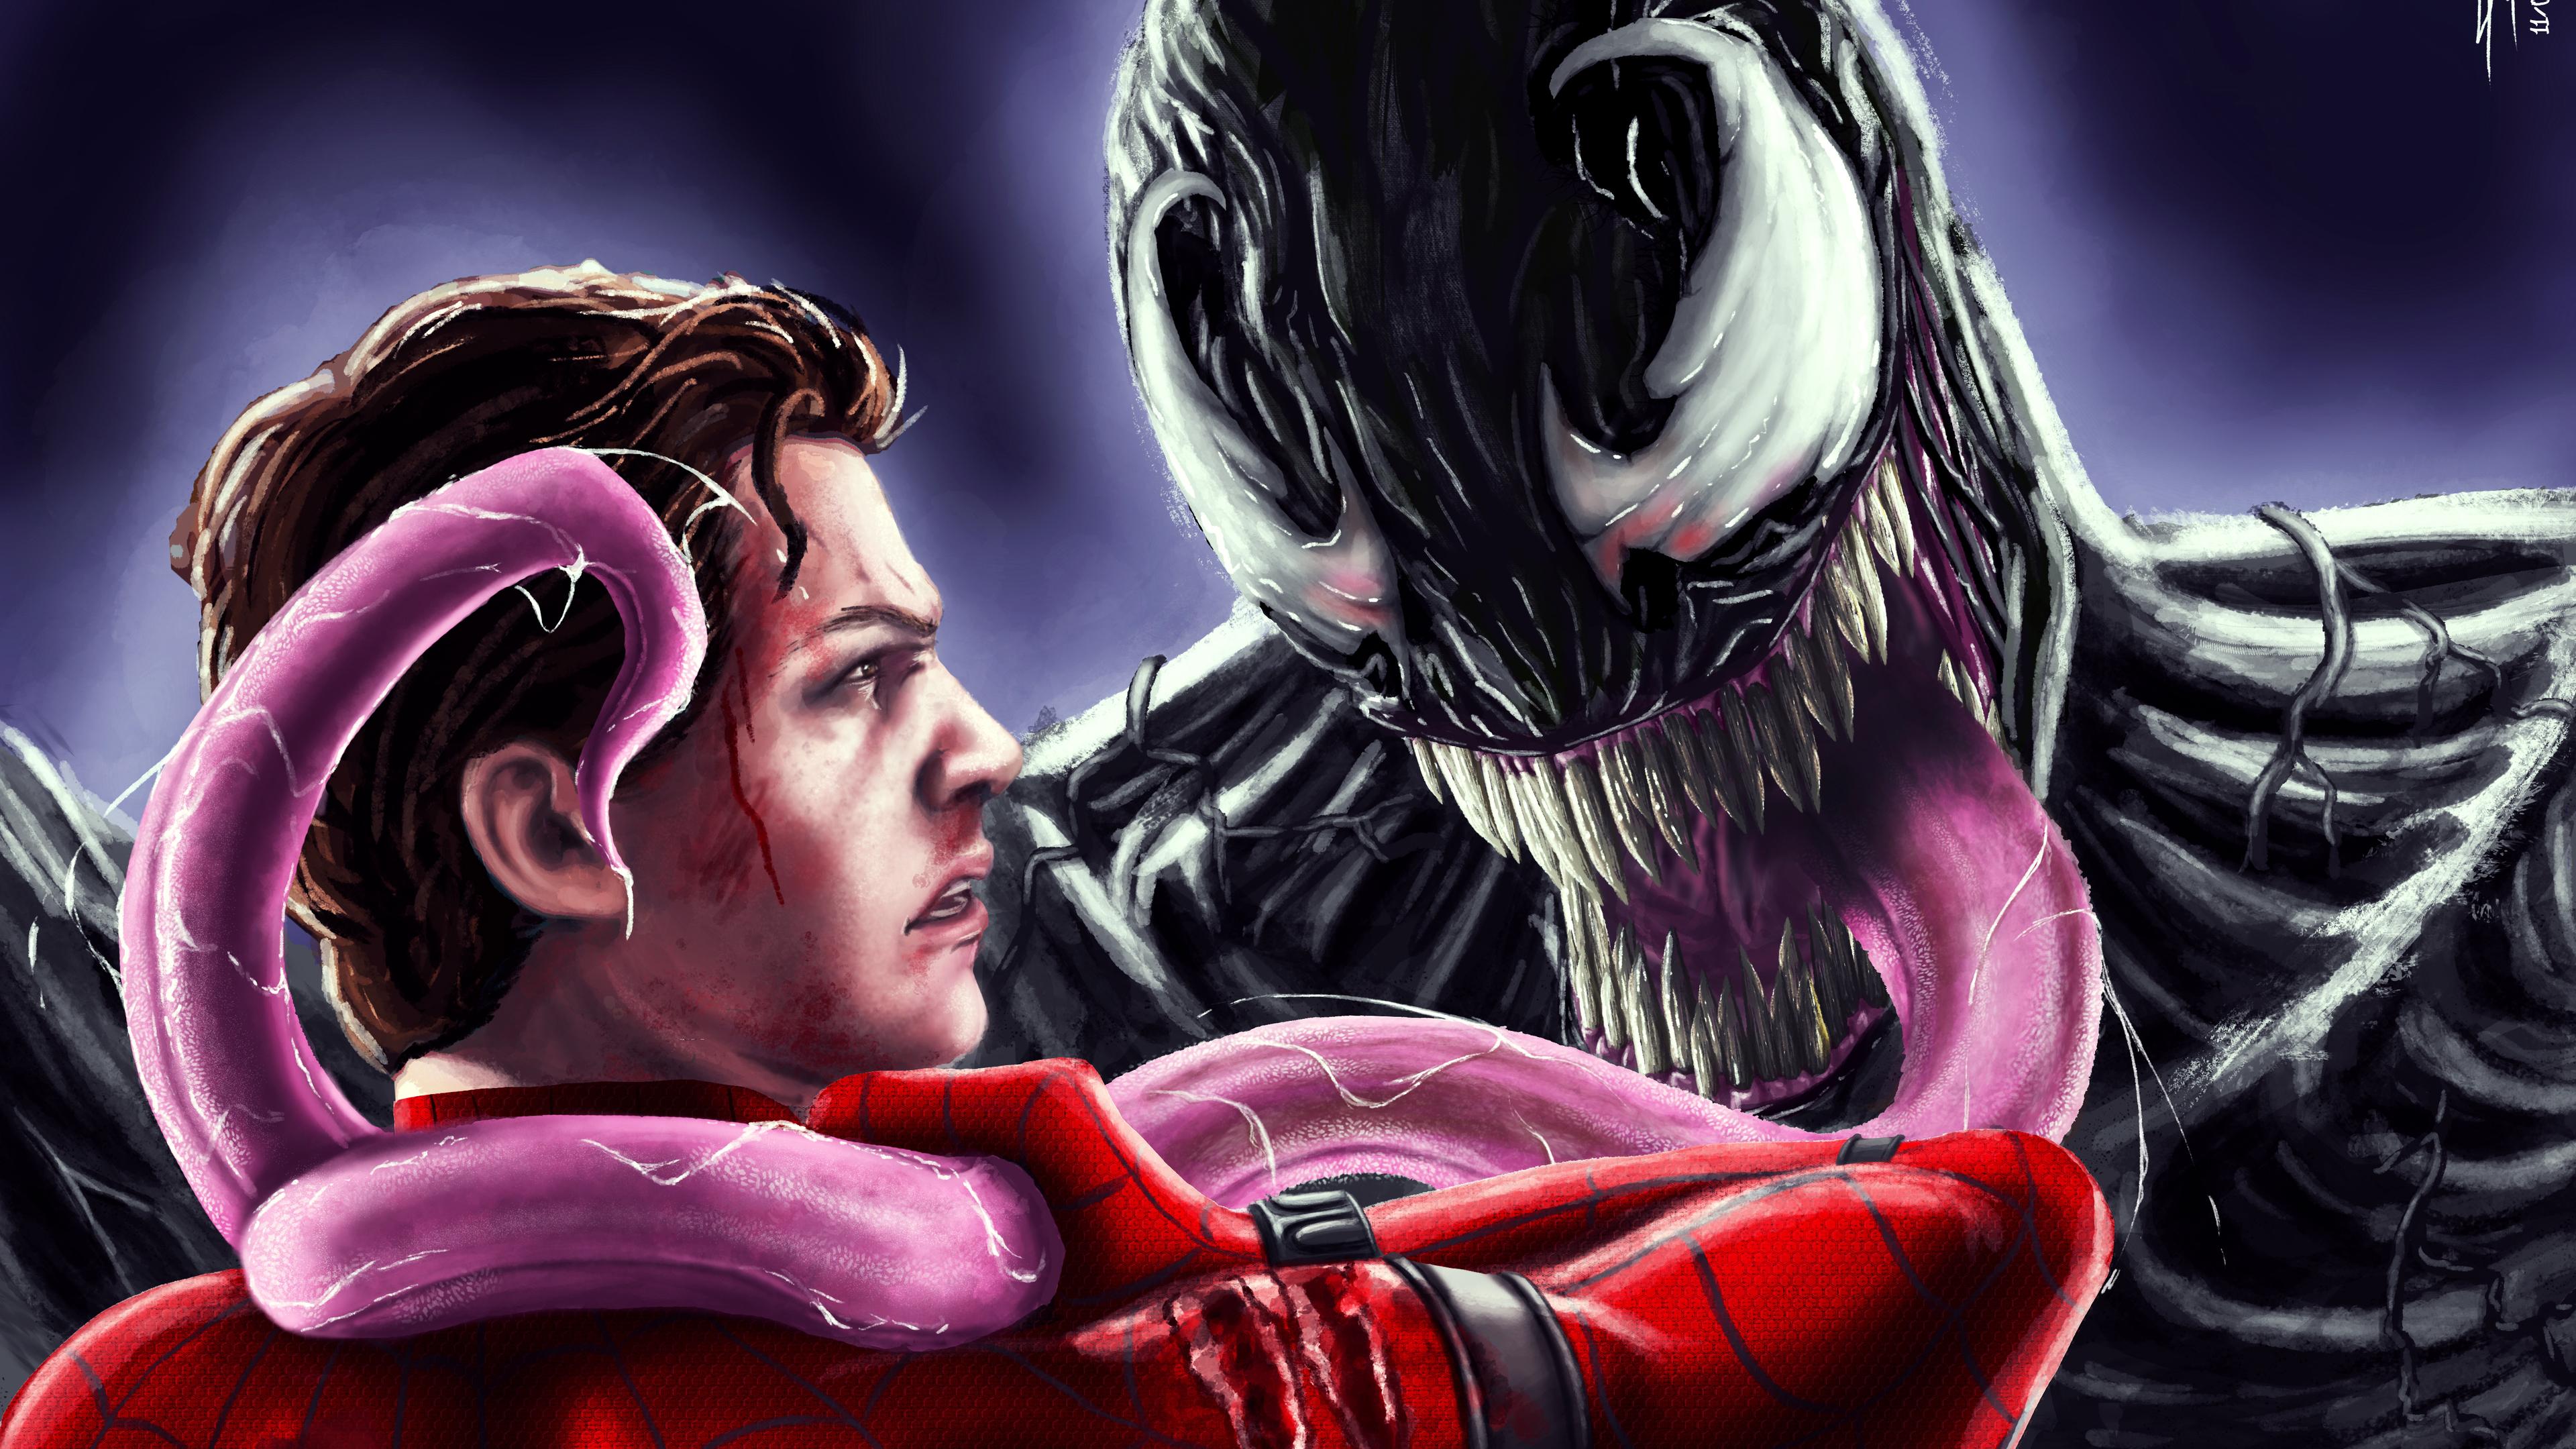 2048x2048 Venom 2018 Movie 4k Ipad Air Hd 4k Wallpapers: Venom Vs Spiderman Homecoming Artwork 5k Venom Wallpapers